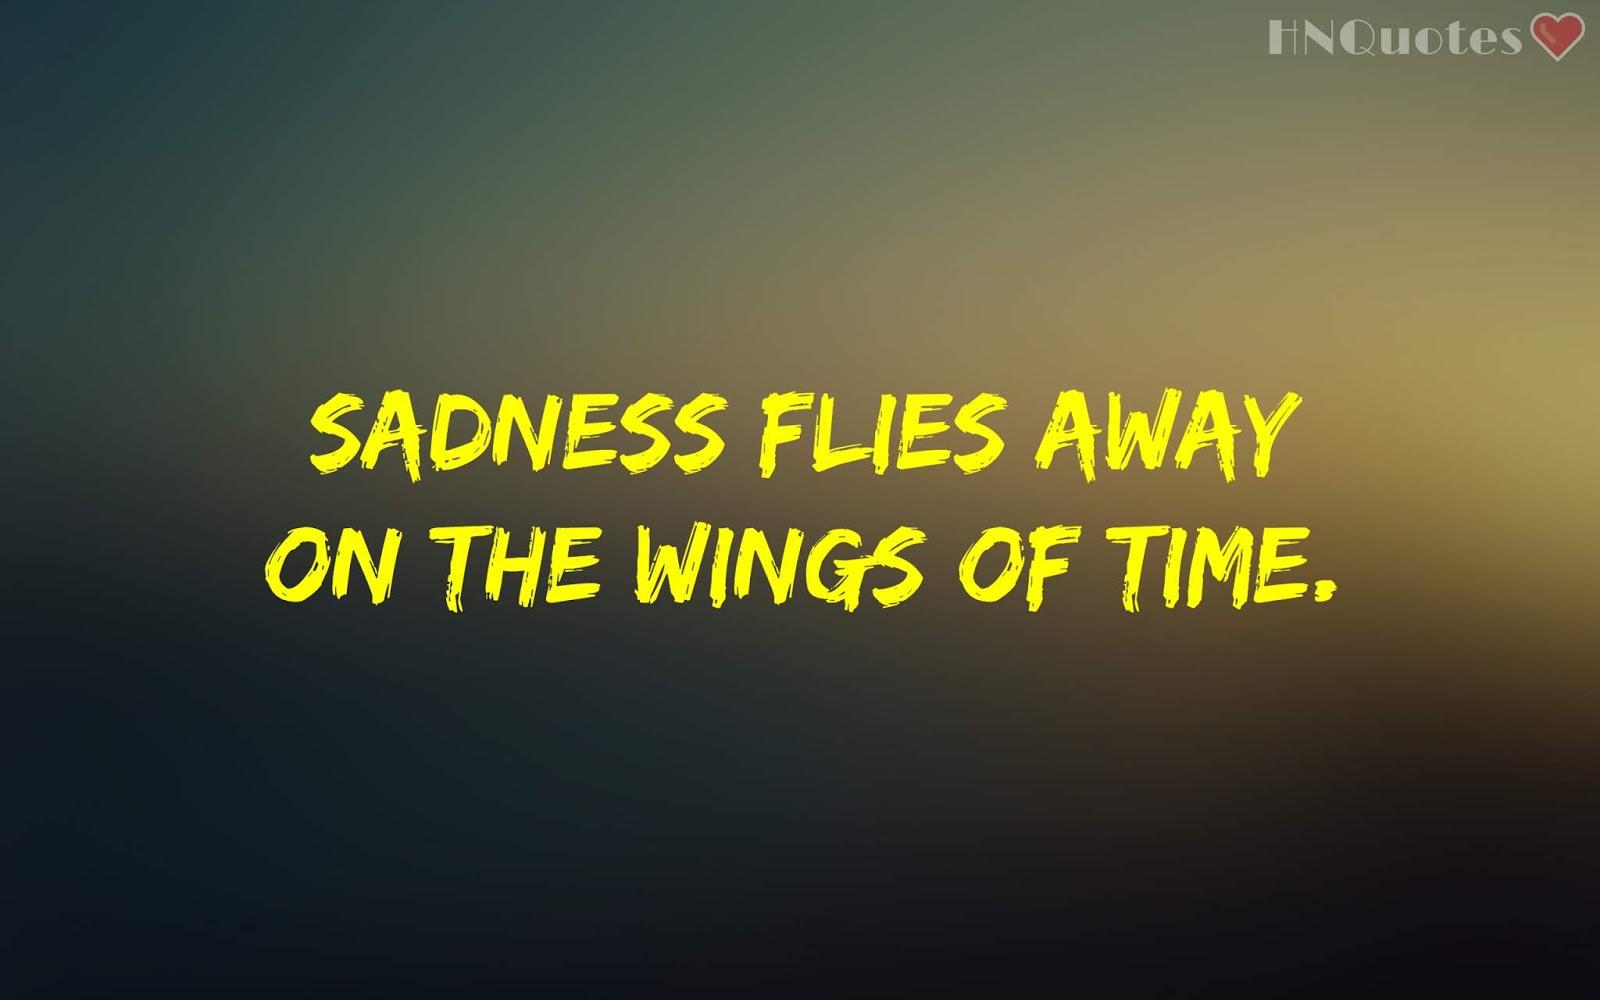 [Sad]-Quotes-on-Life-20-[HNQuotes]